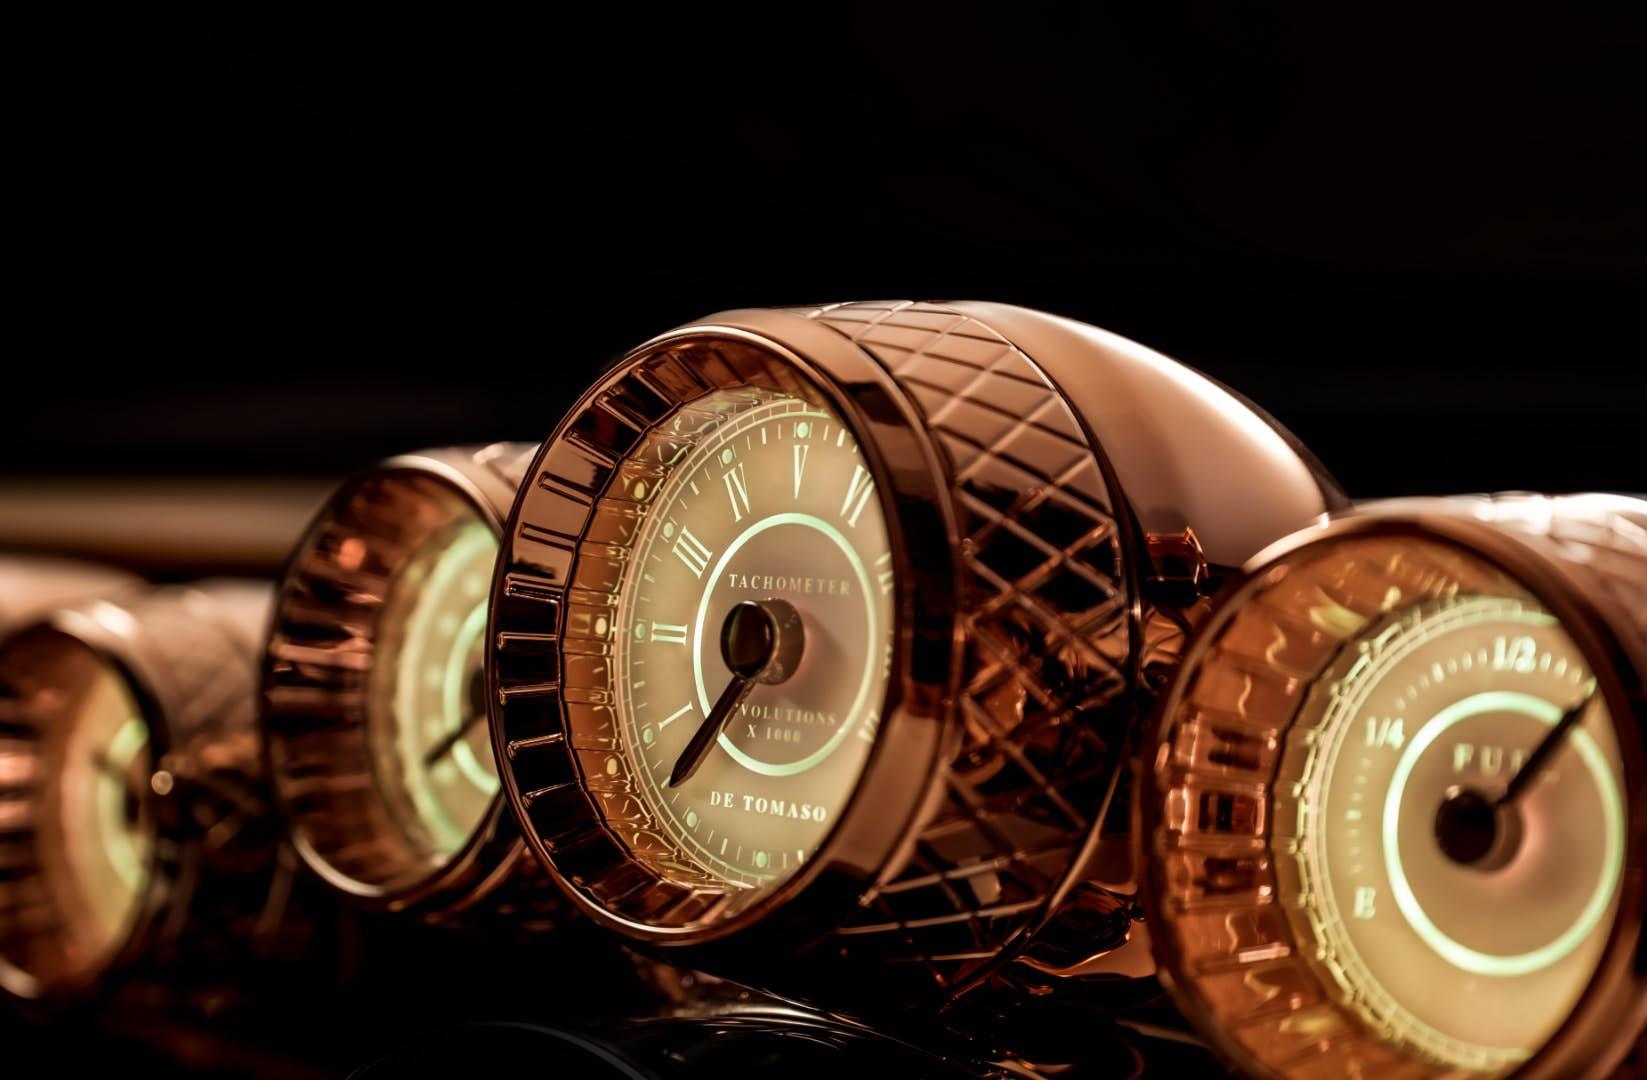 Beautifully detailed retro gauges inside the De Tomaso P72